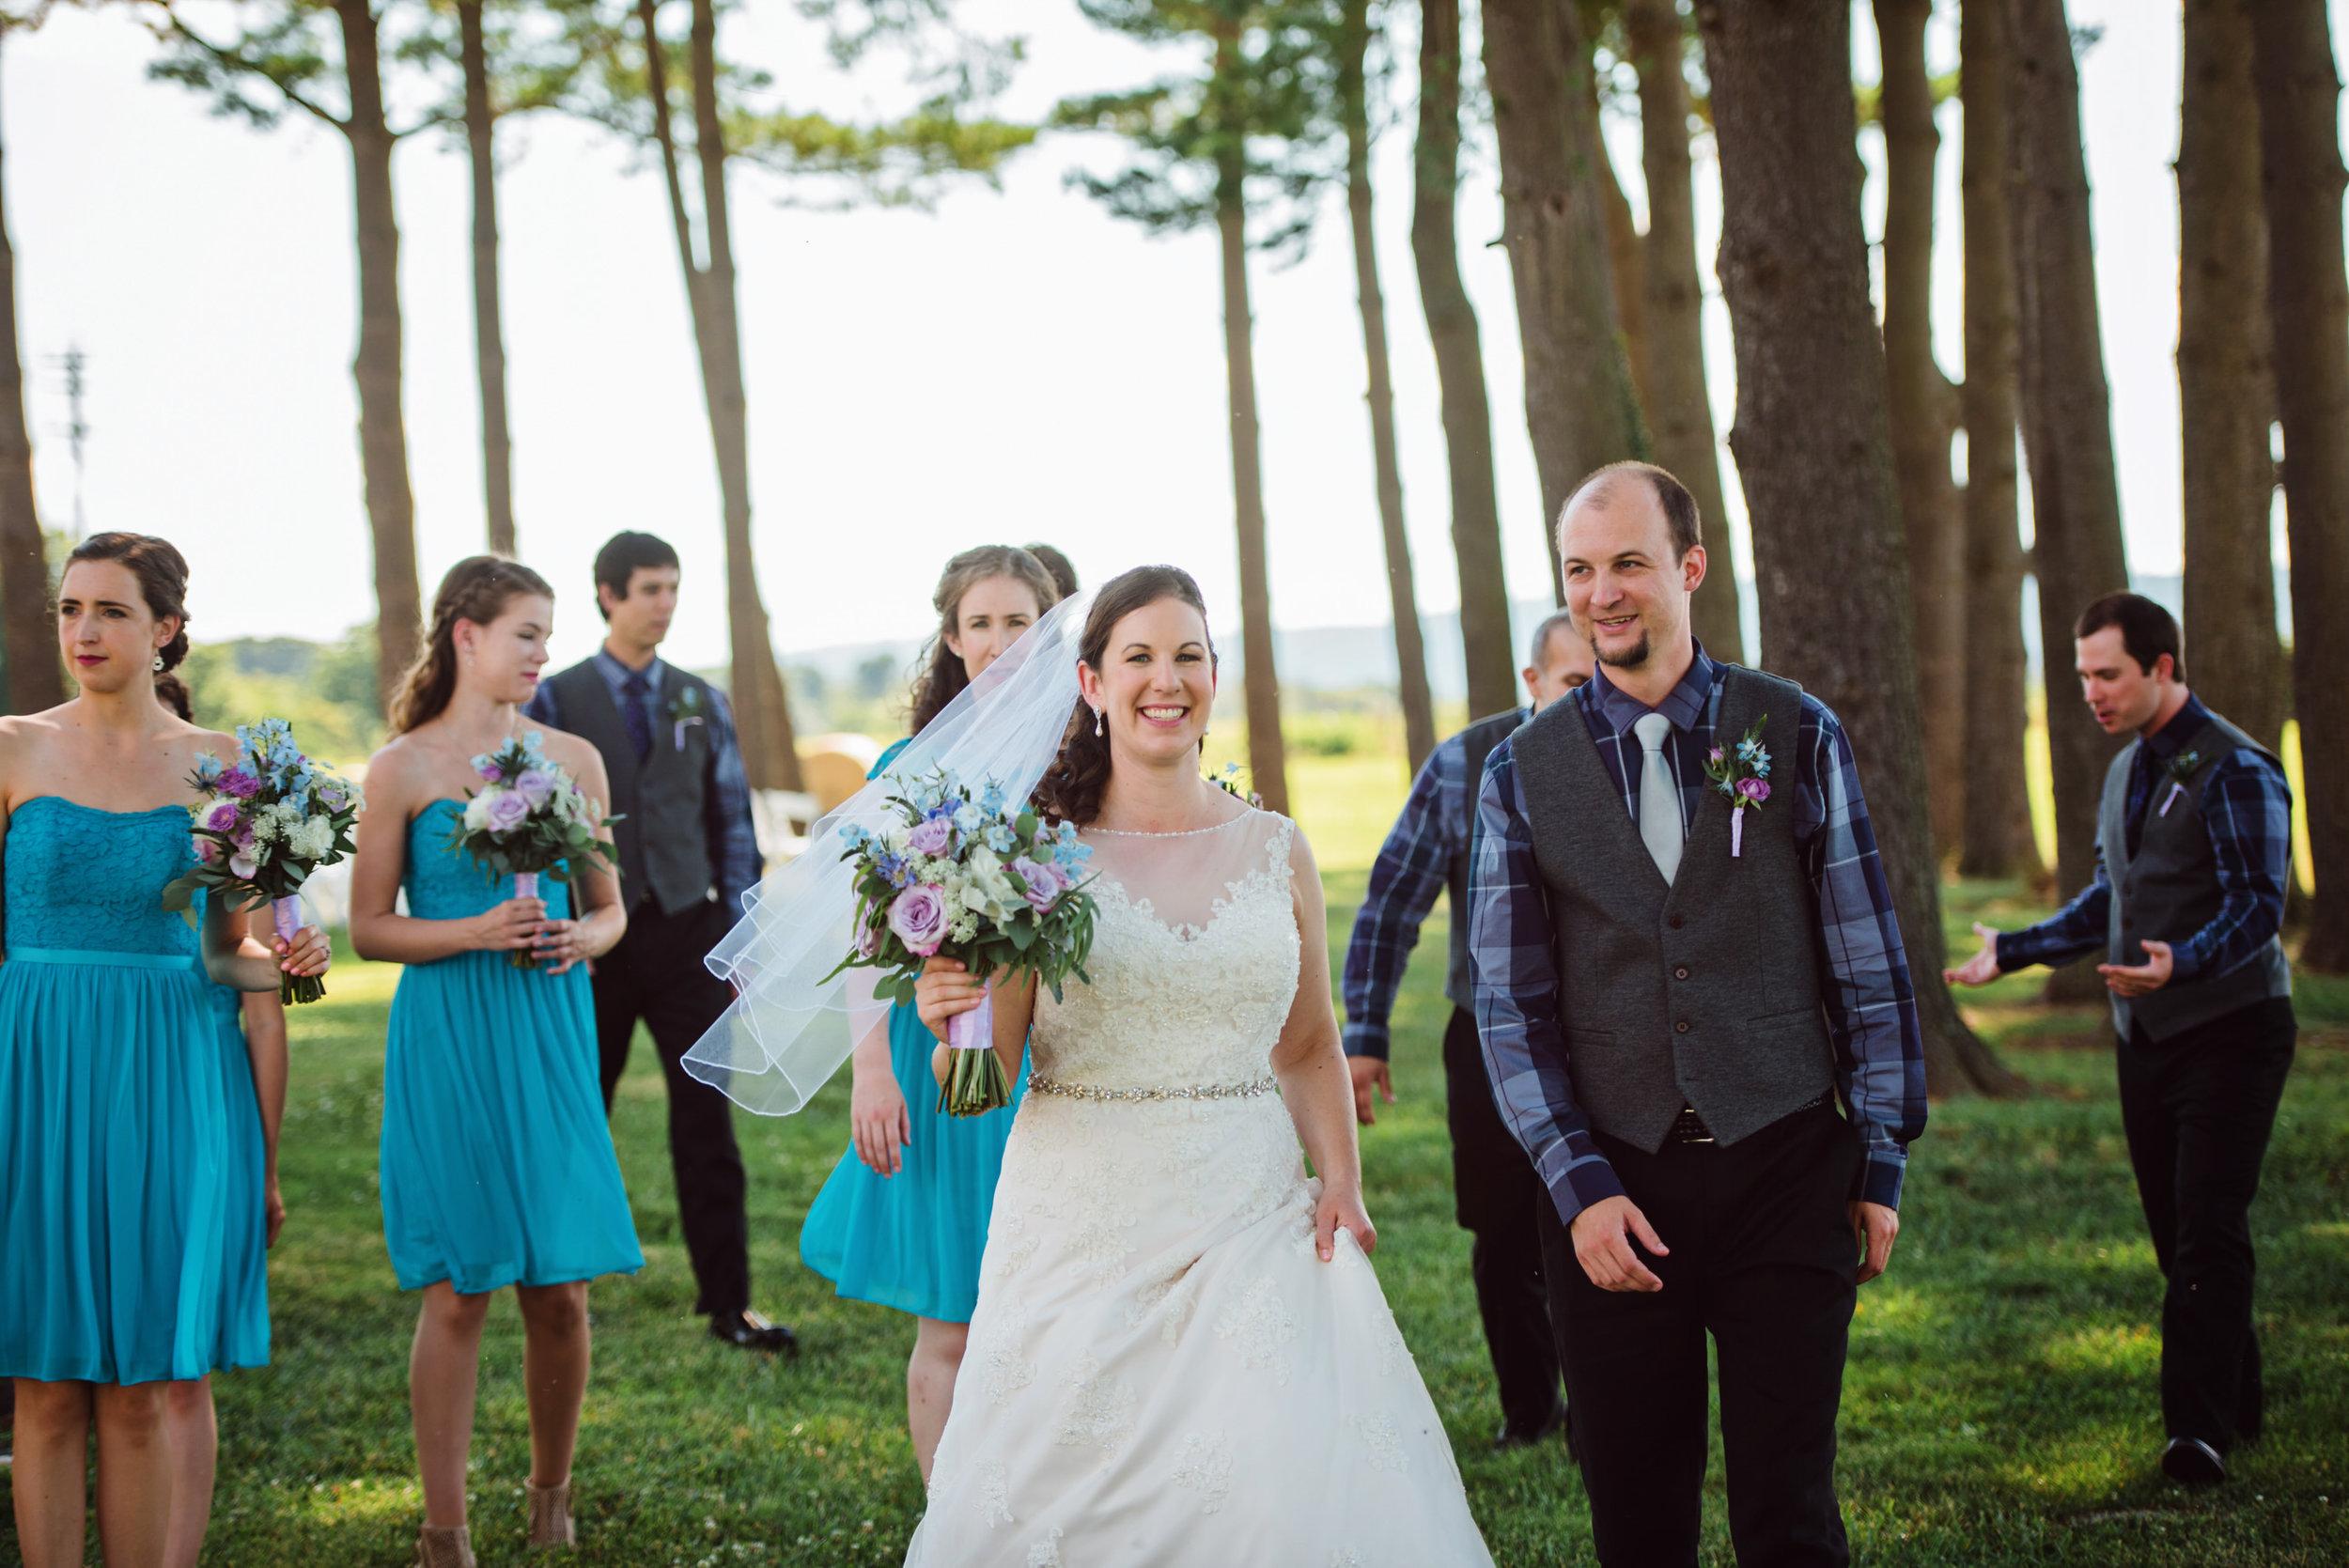 EastLynnFarmWedding-Steph&Aaron-Family-WP-37.jpg